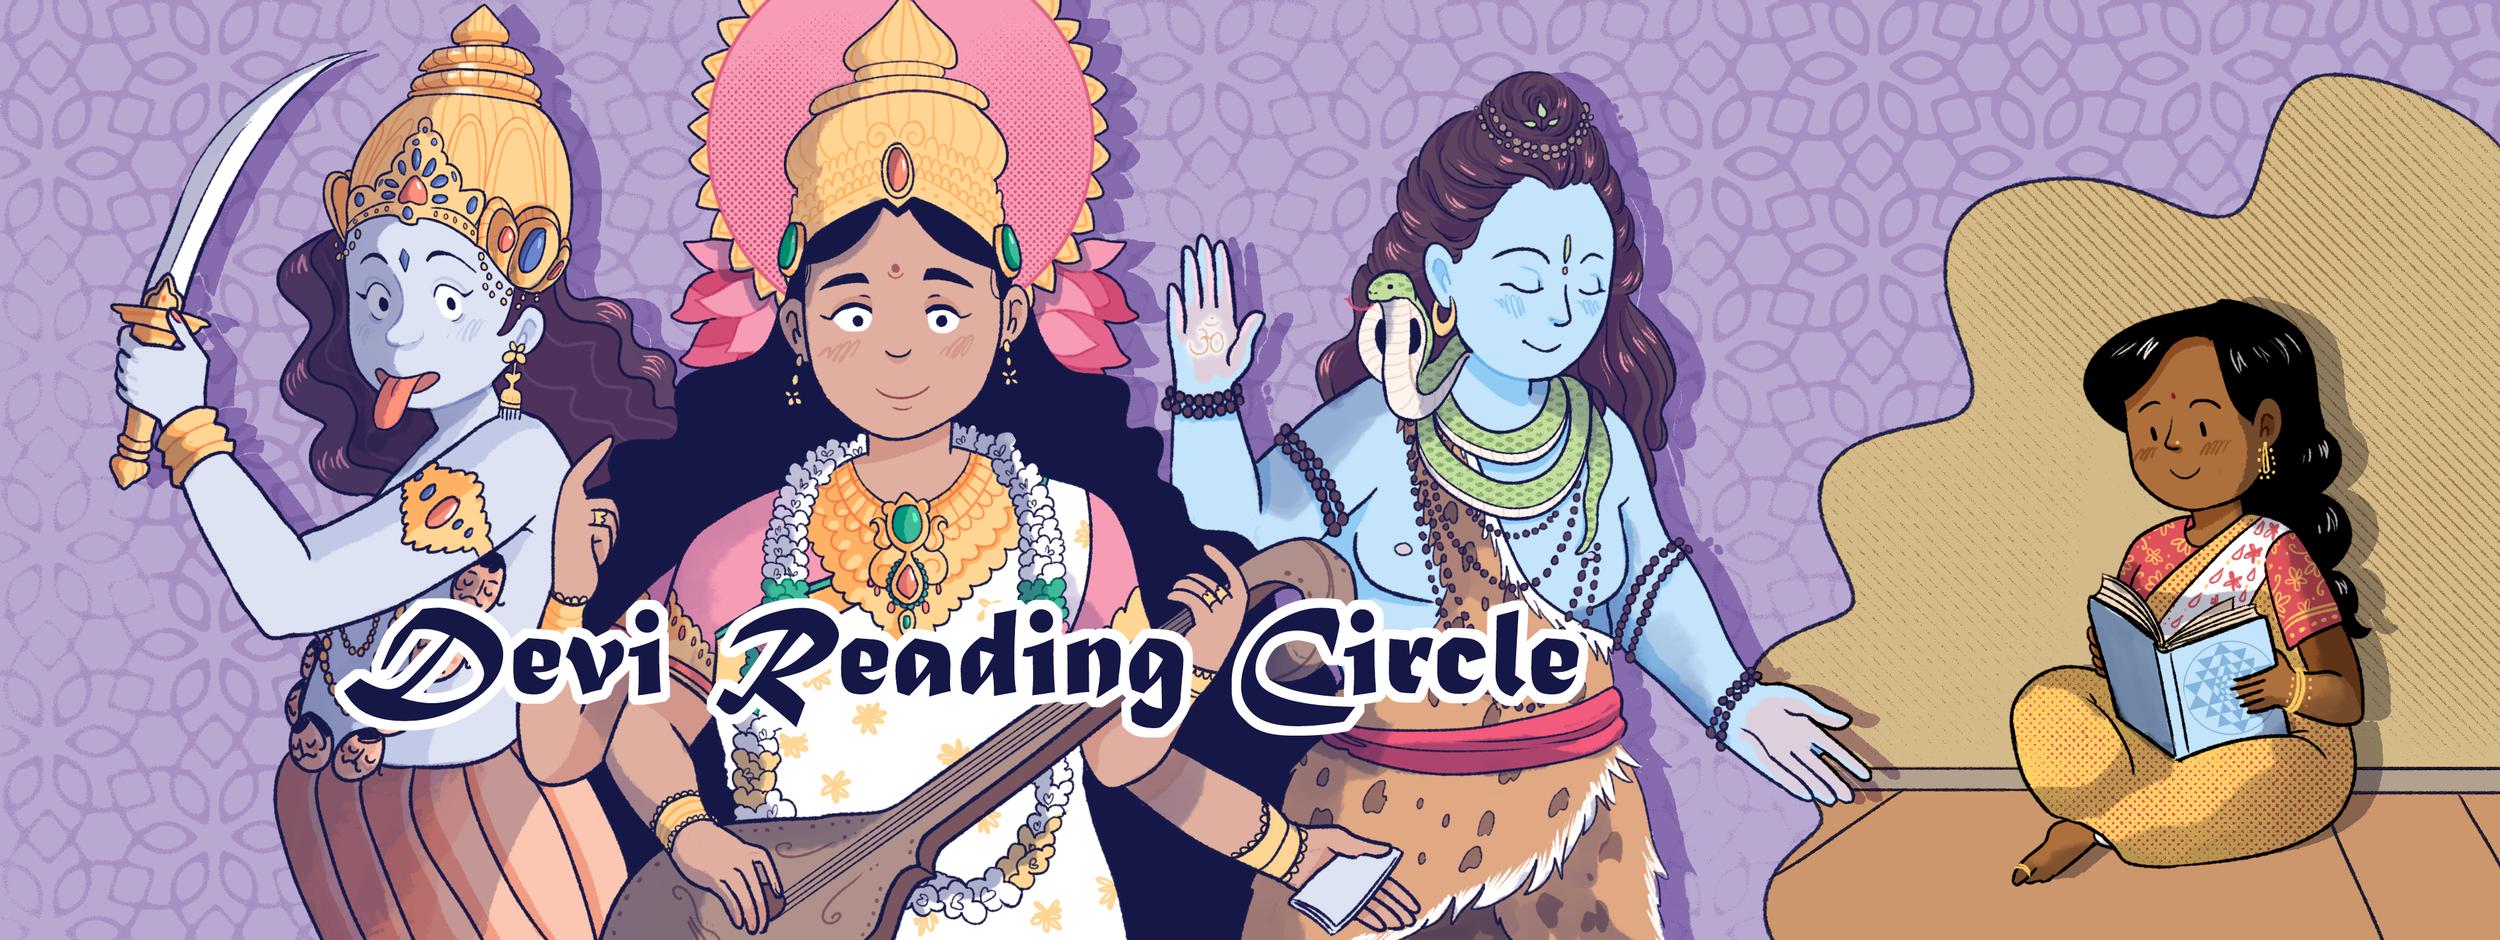 Illustration for the Devi Reading Circle Facebook Group  Digital 2017